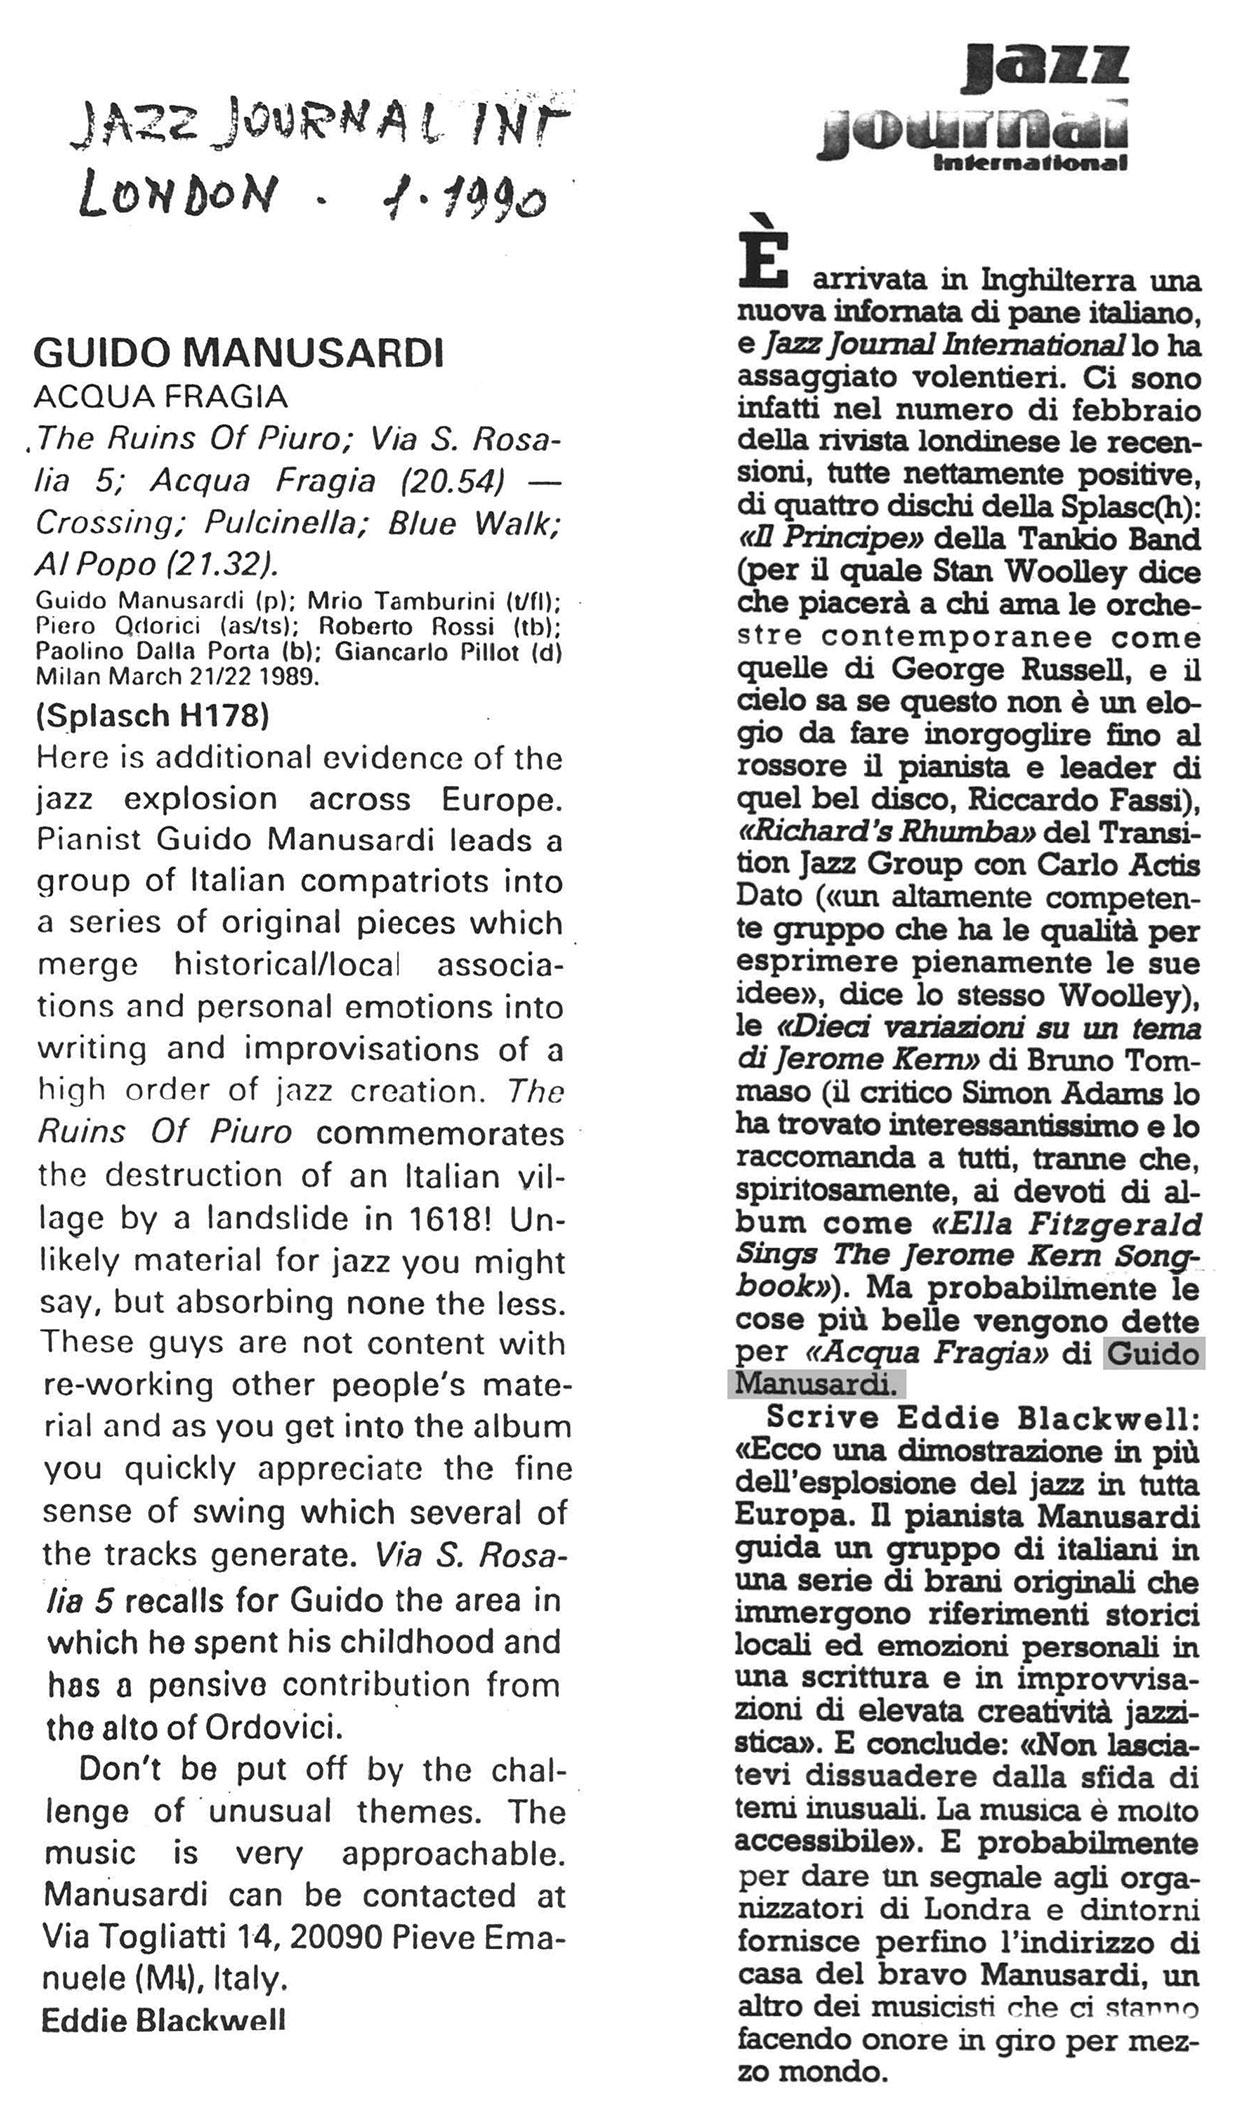 JAZZ JOURNAL 1990